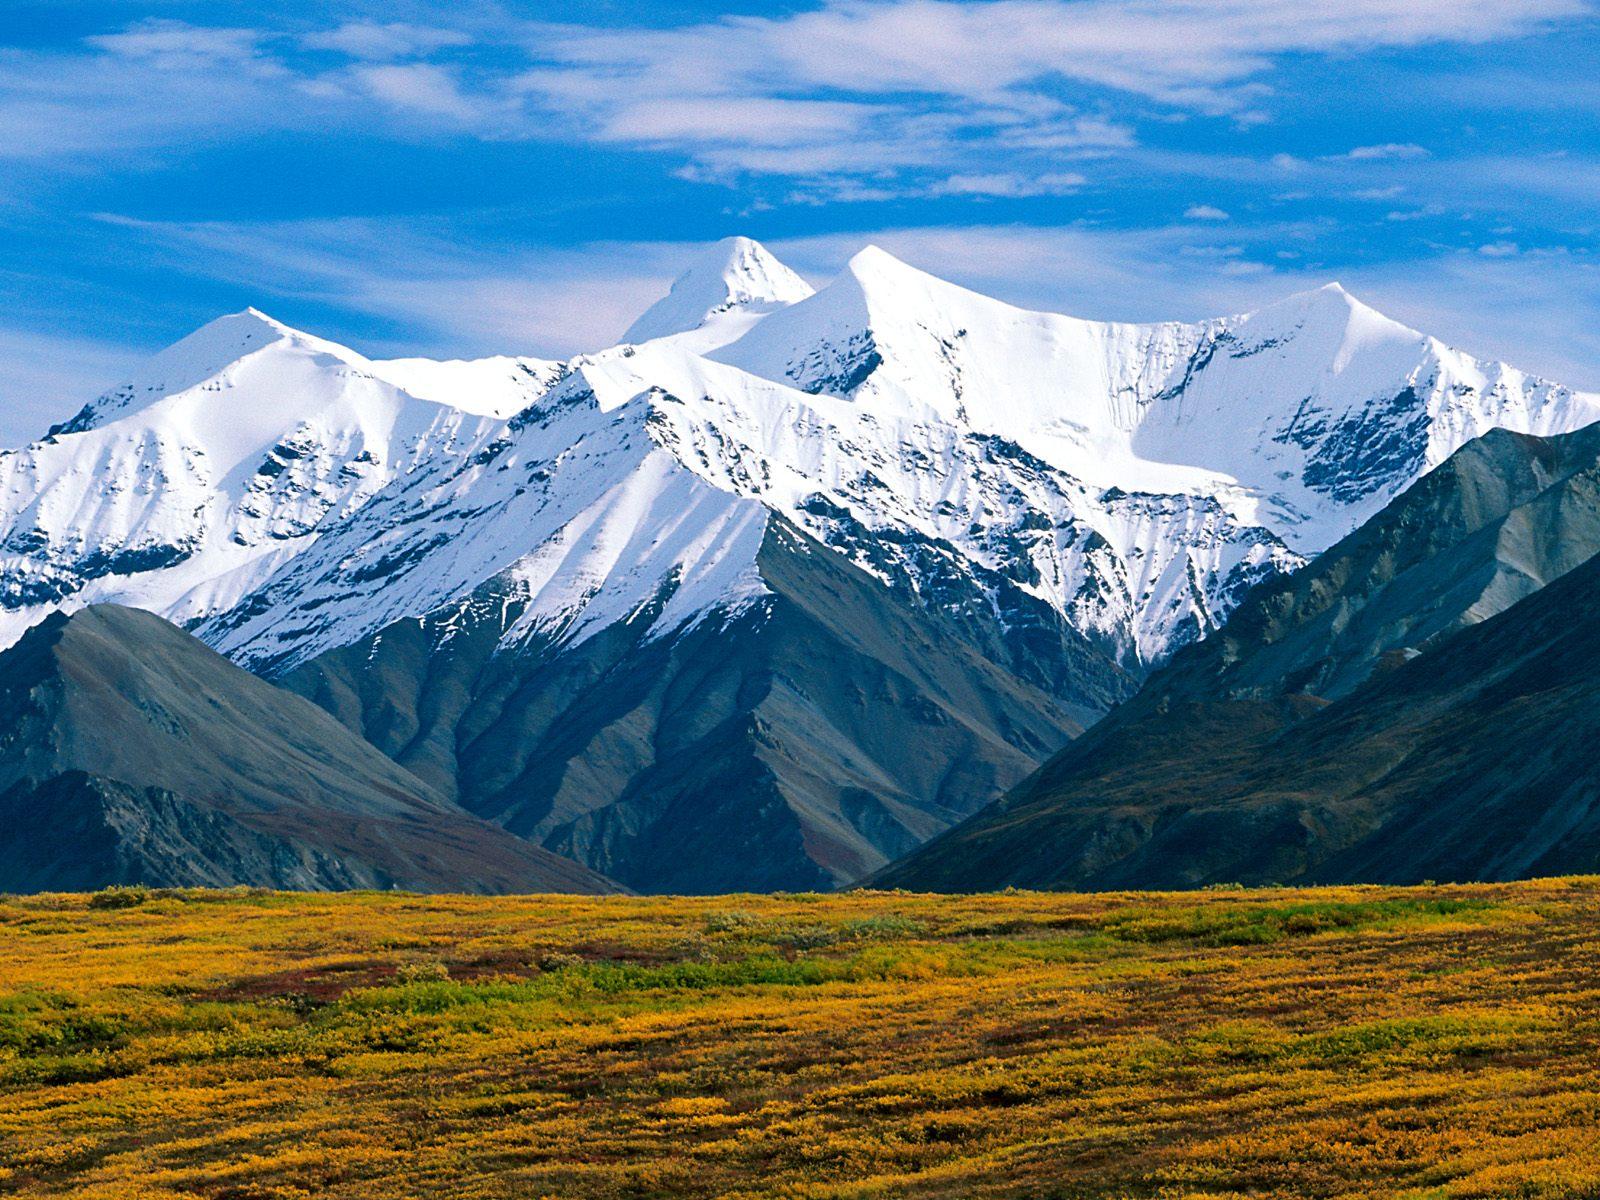 Denali National Park Alaska Wallpapers HD Wallpapers 1600x1200